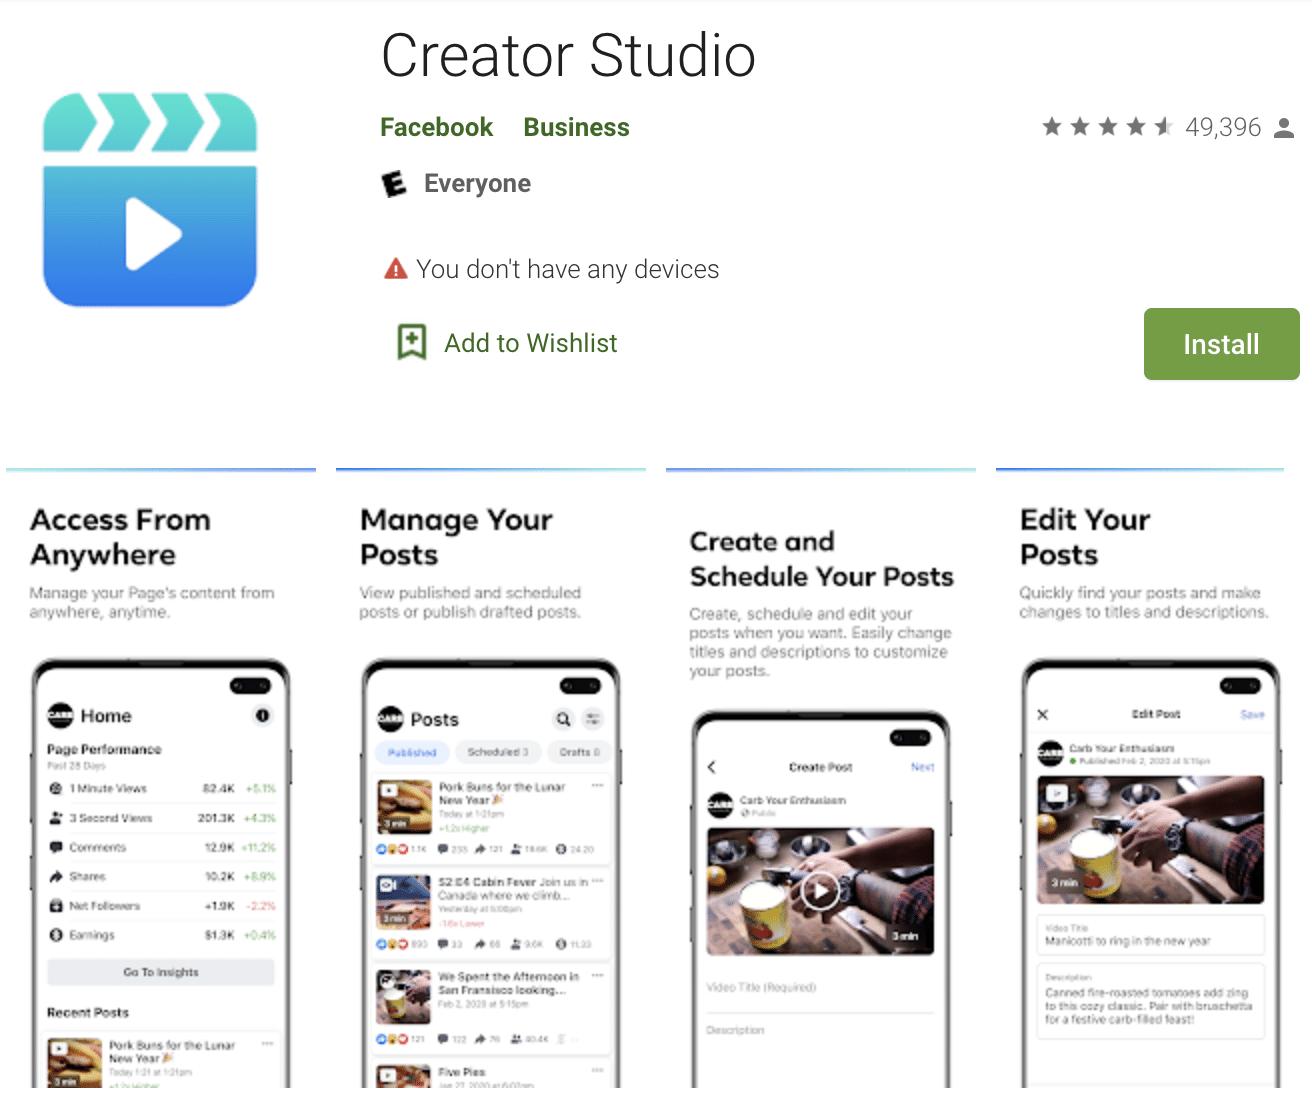 Приложение Creator Studio для iOS и Android